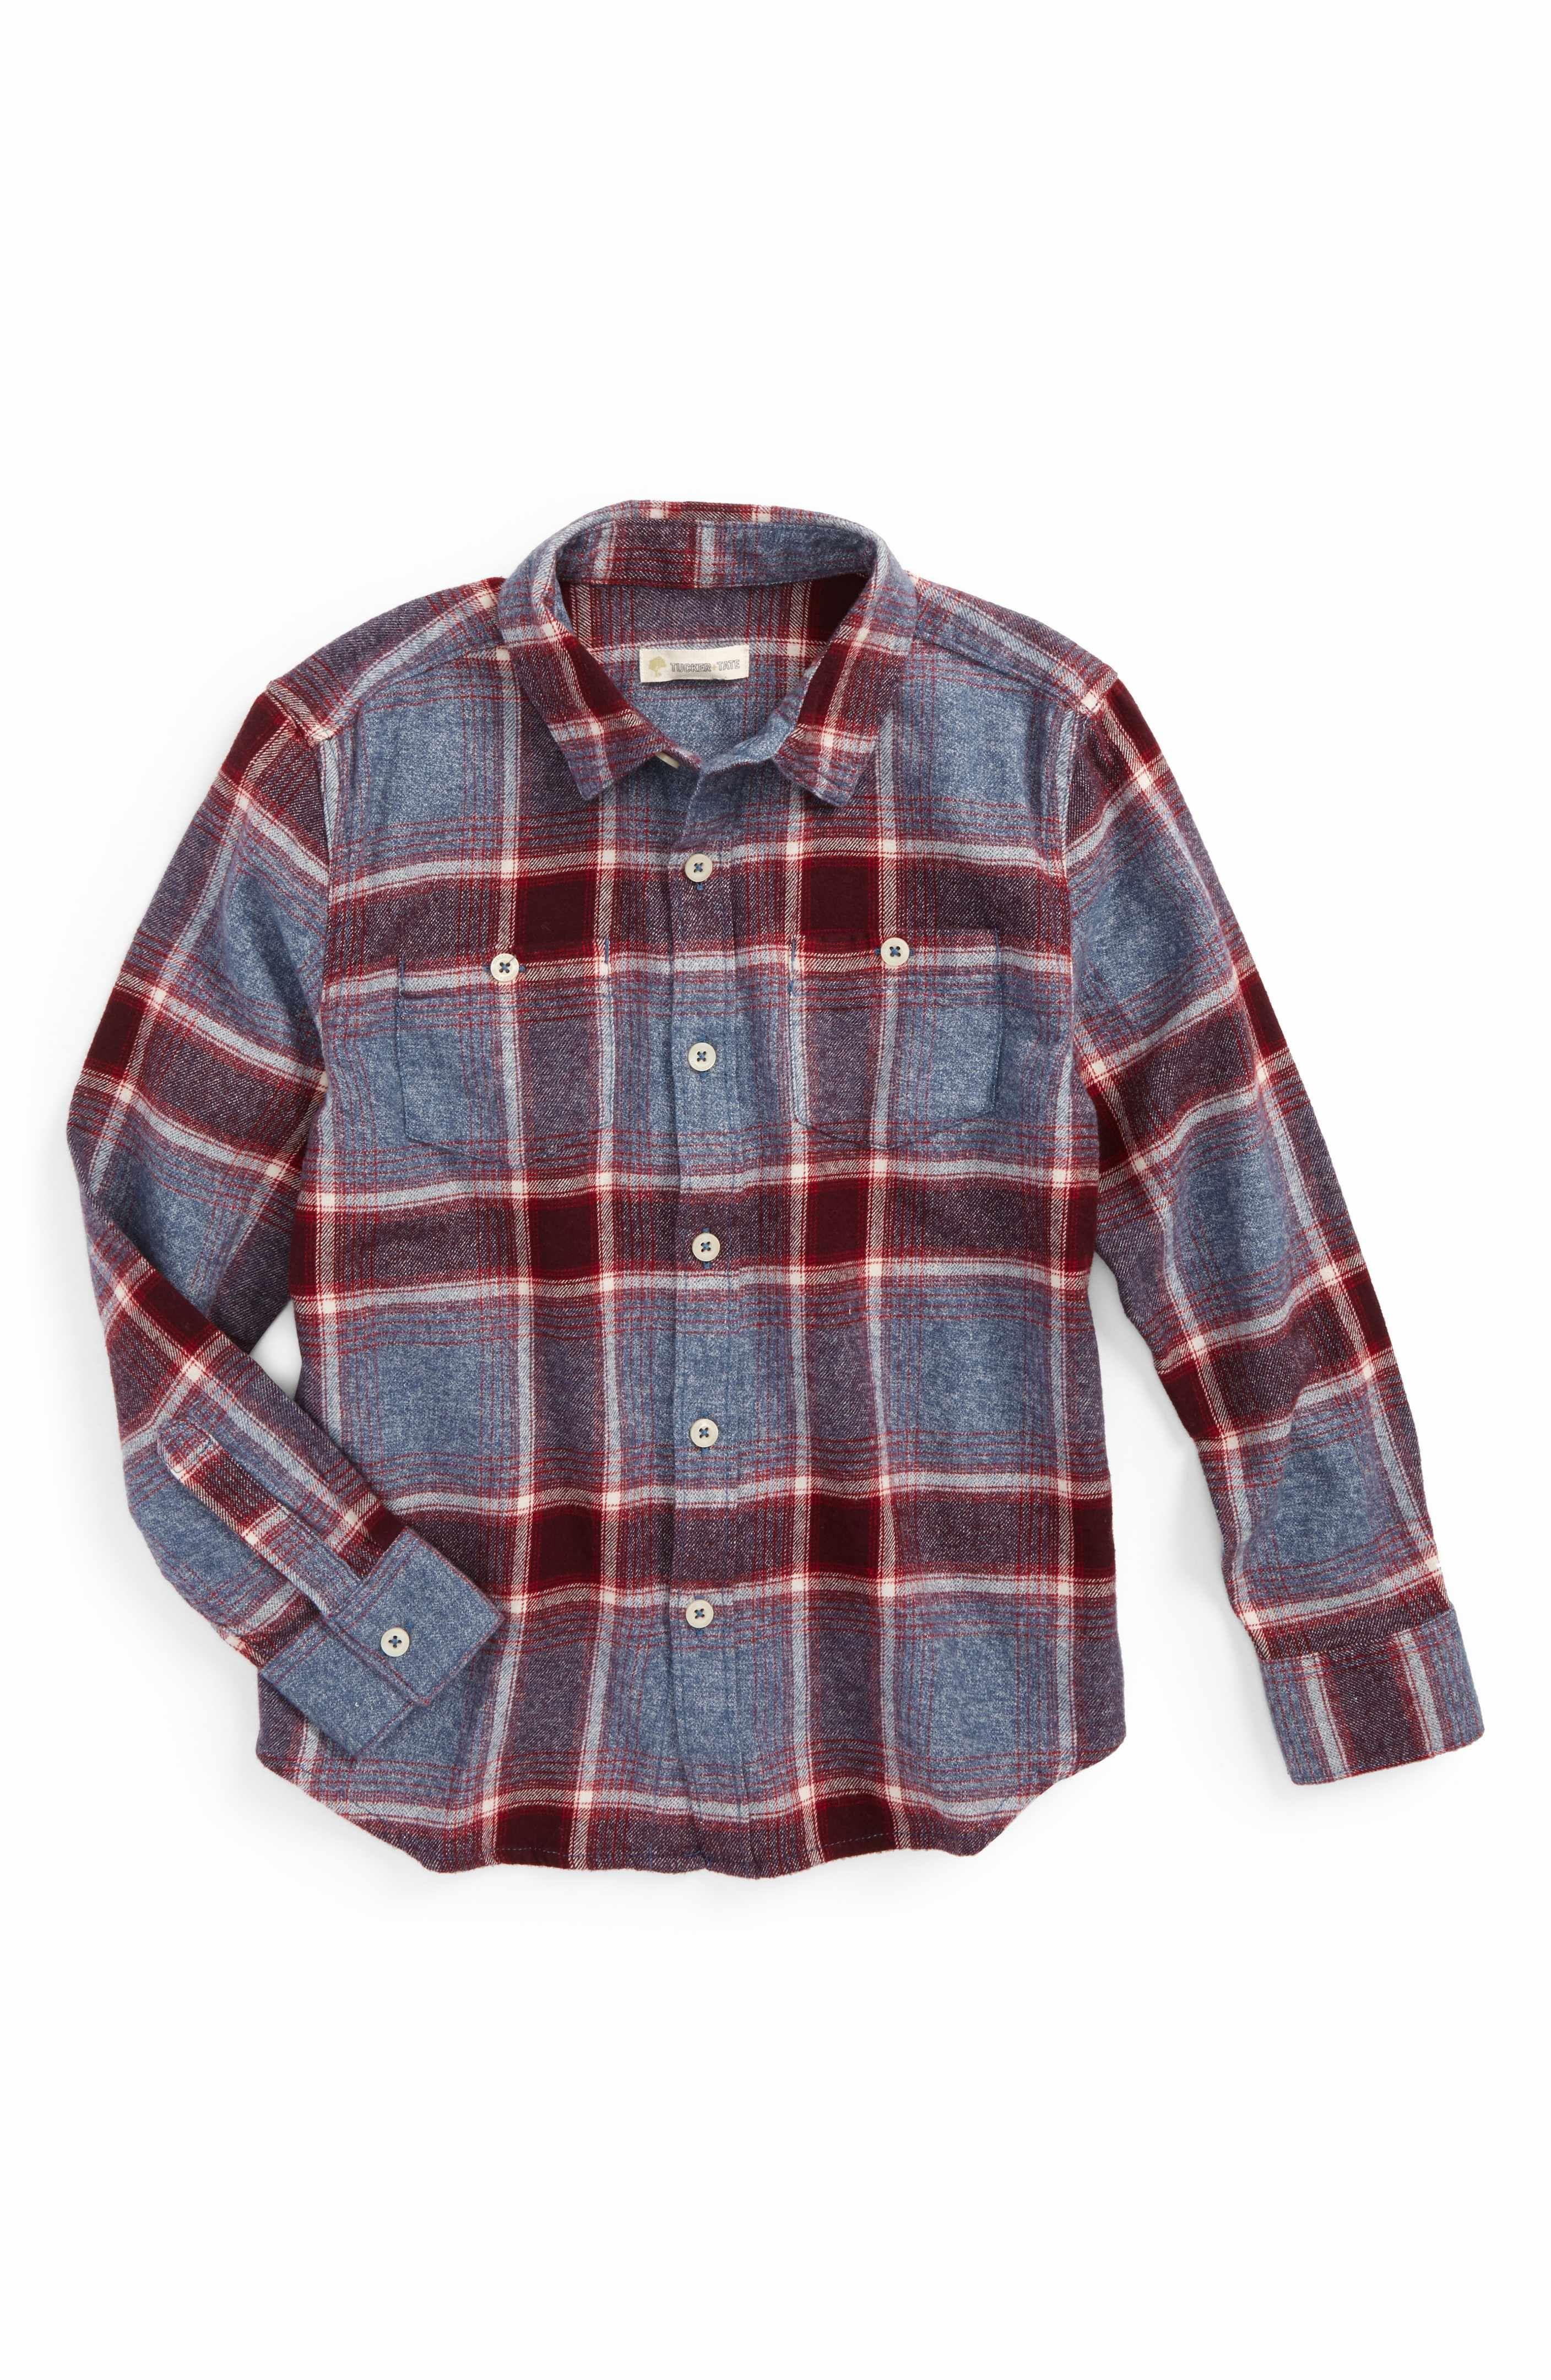 36a63a7f2 Main Image - Tucker + Tate Plaid Flannel Shirt (Toddler Boys & Little Boys)